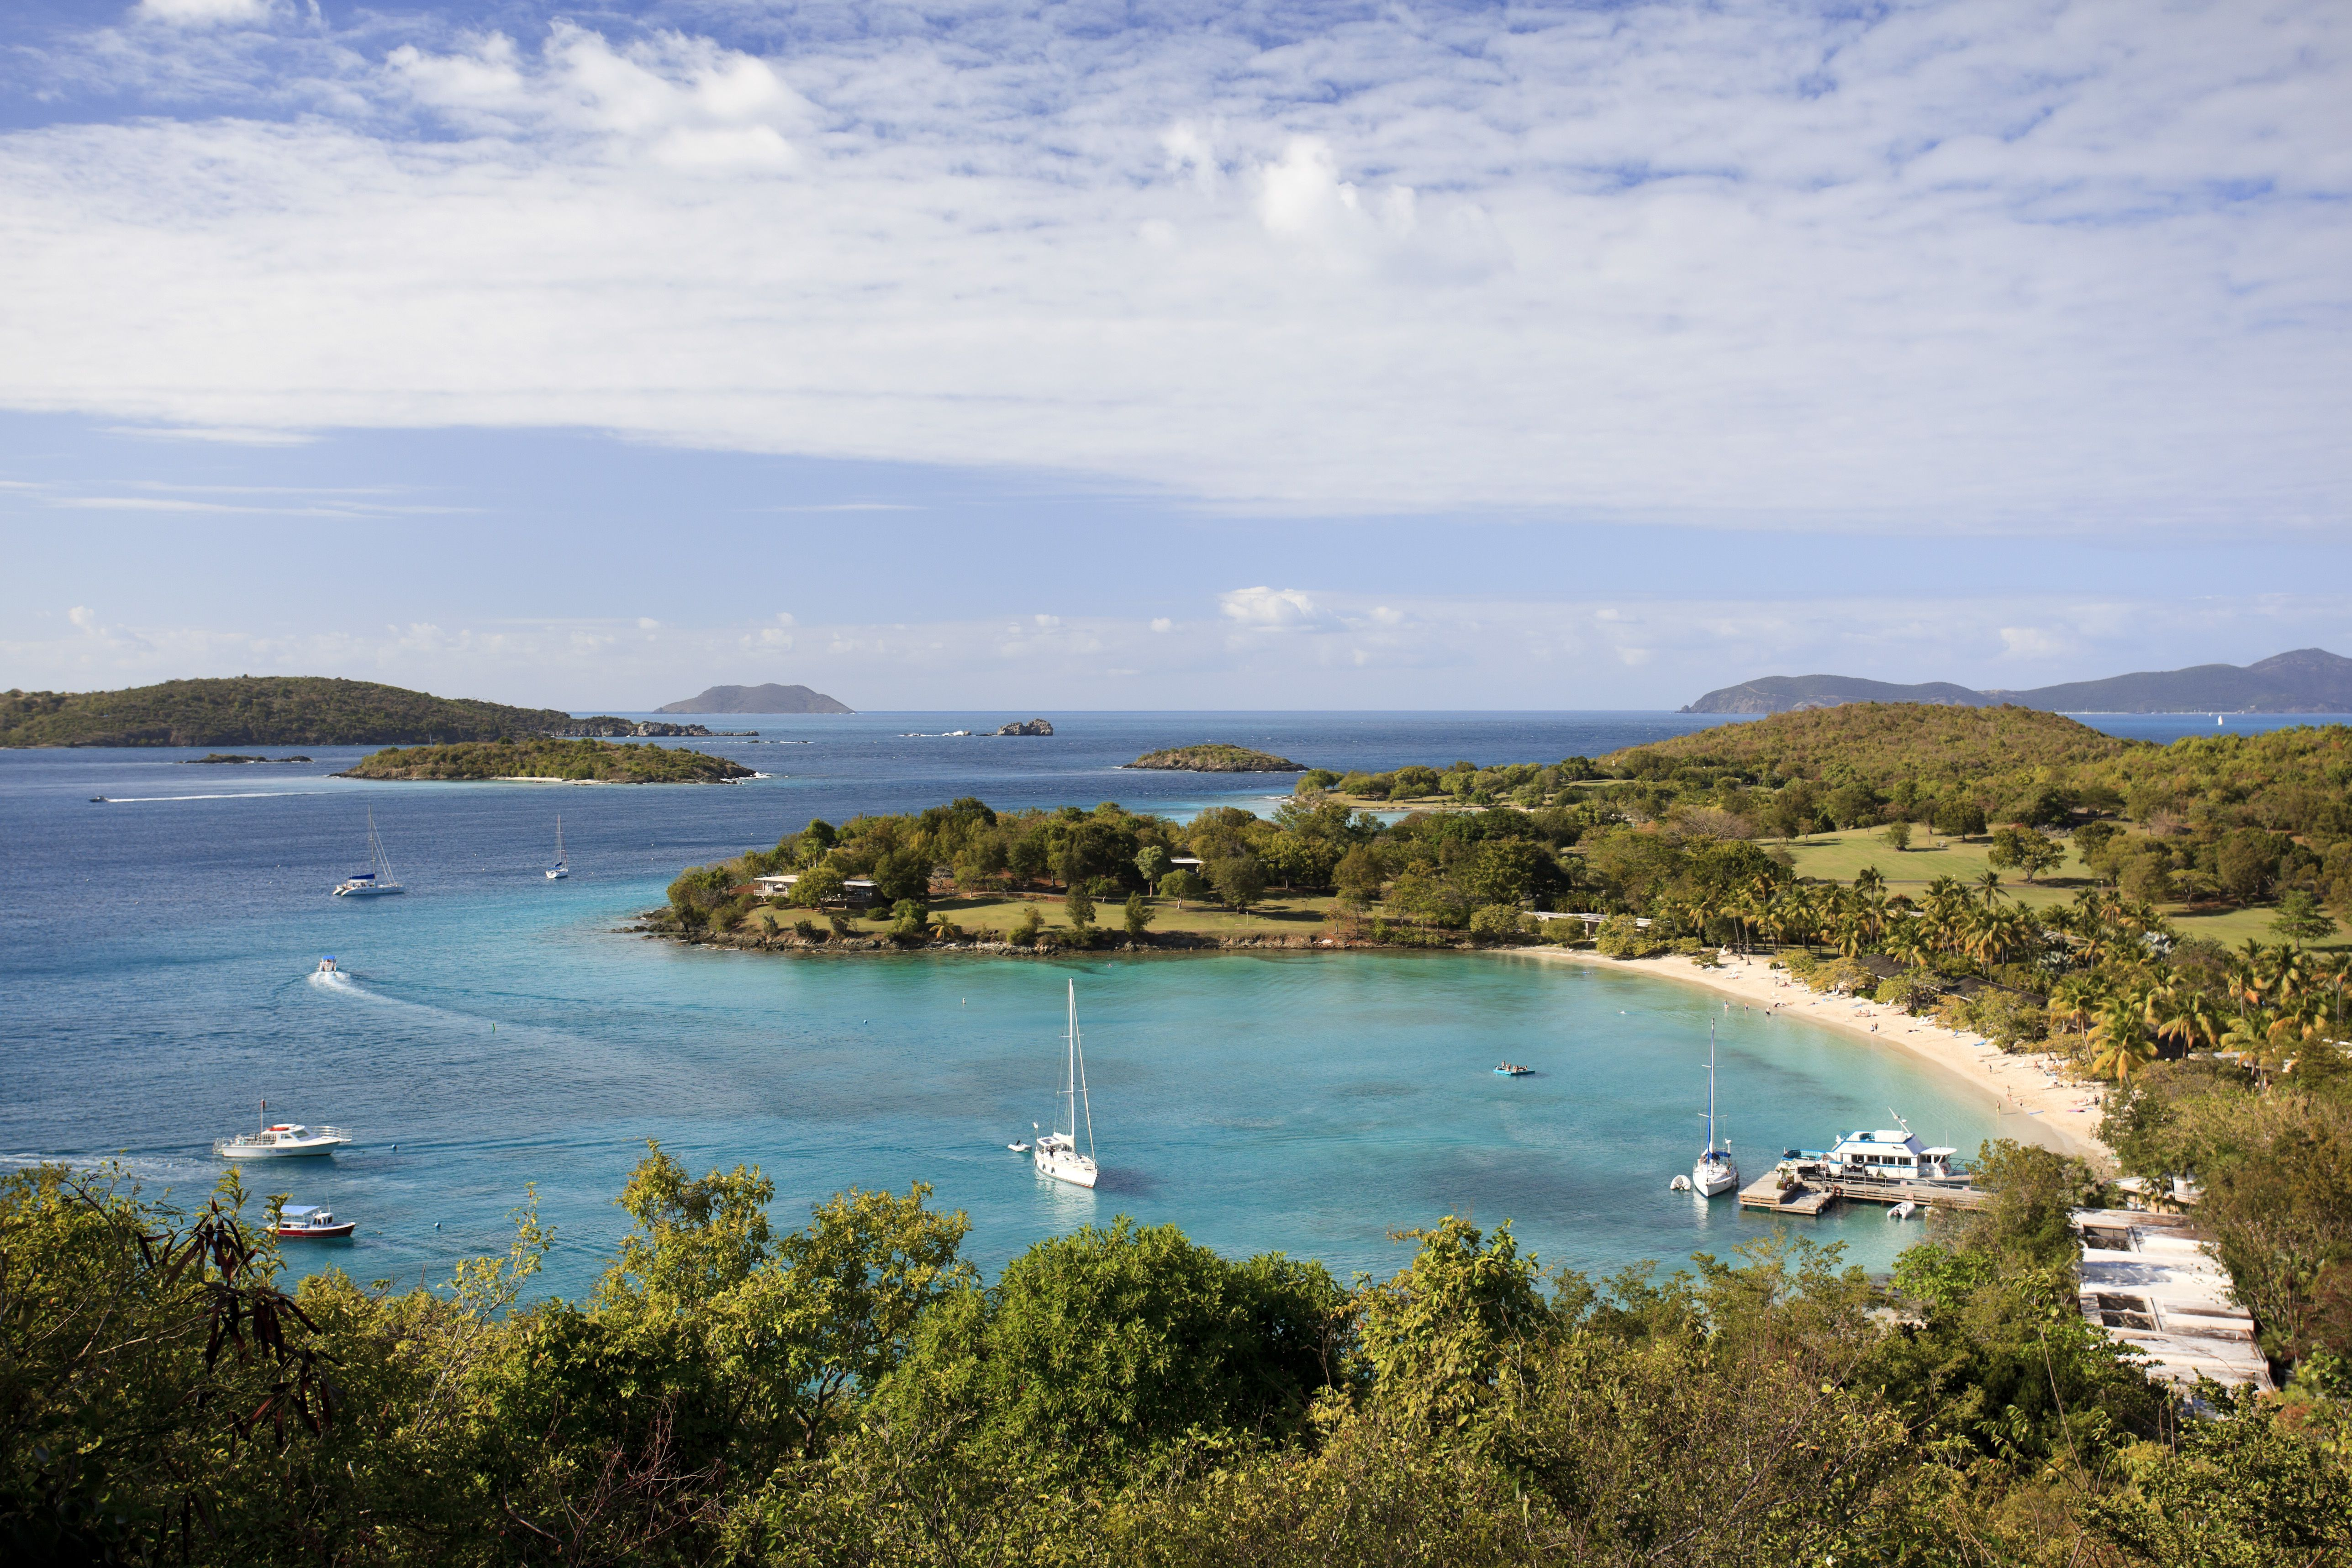 Virgin Islands National Park, Caneel Bay and resort